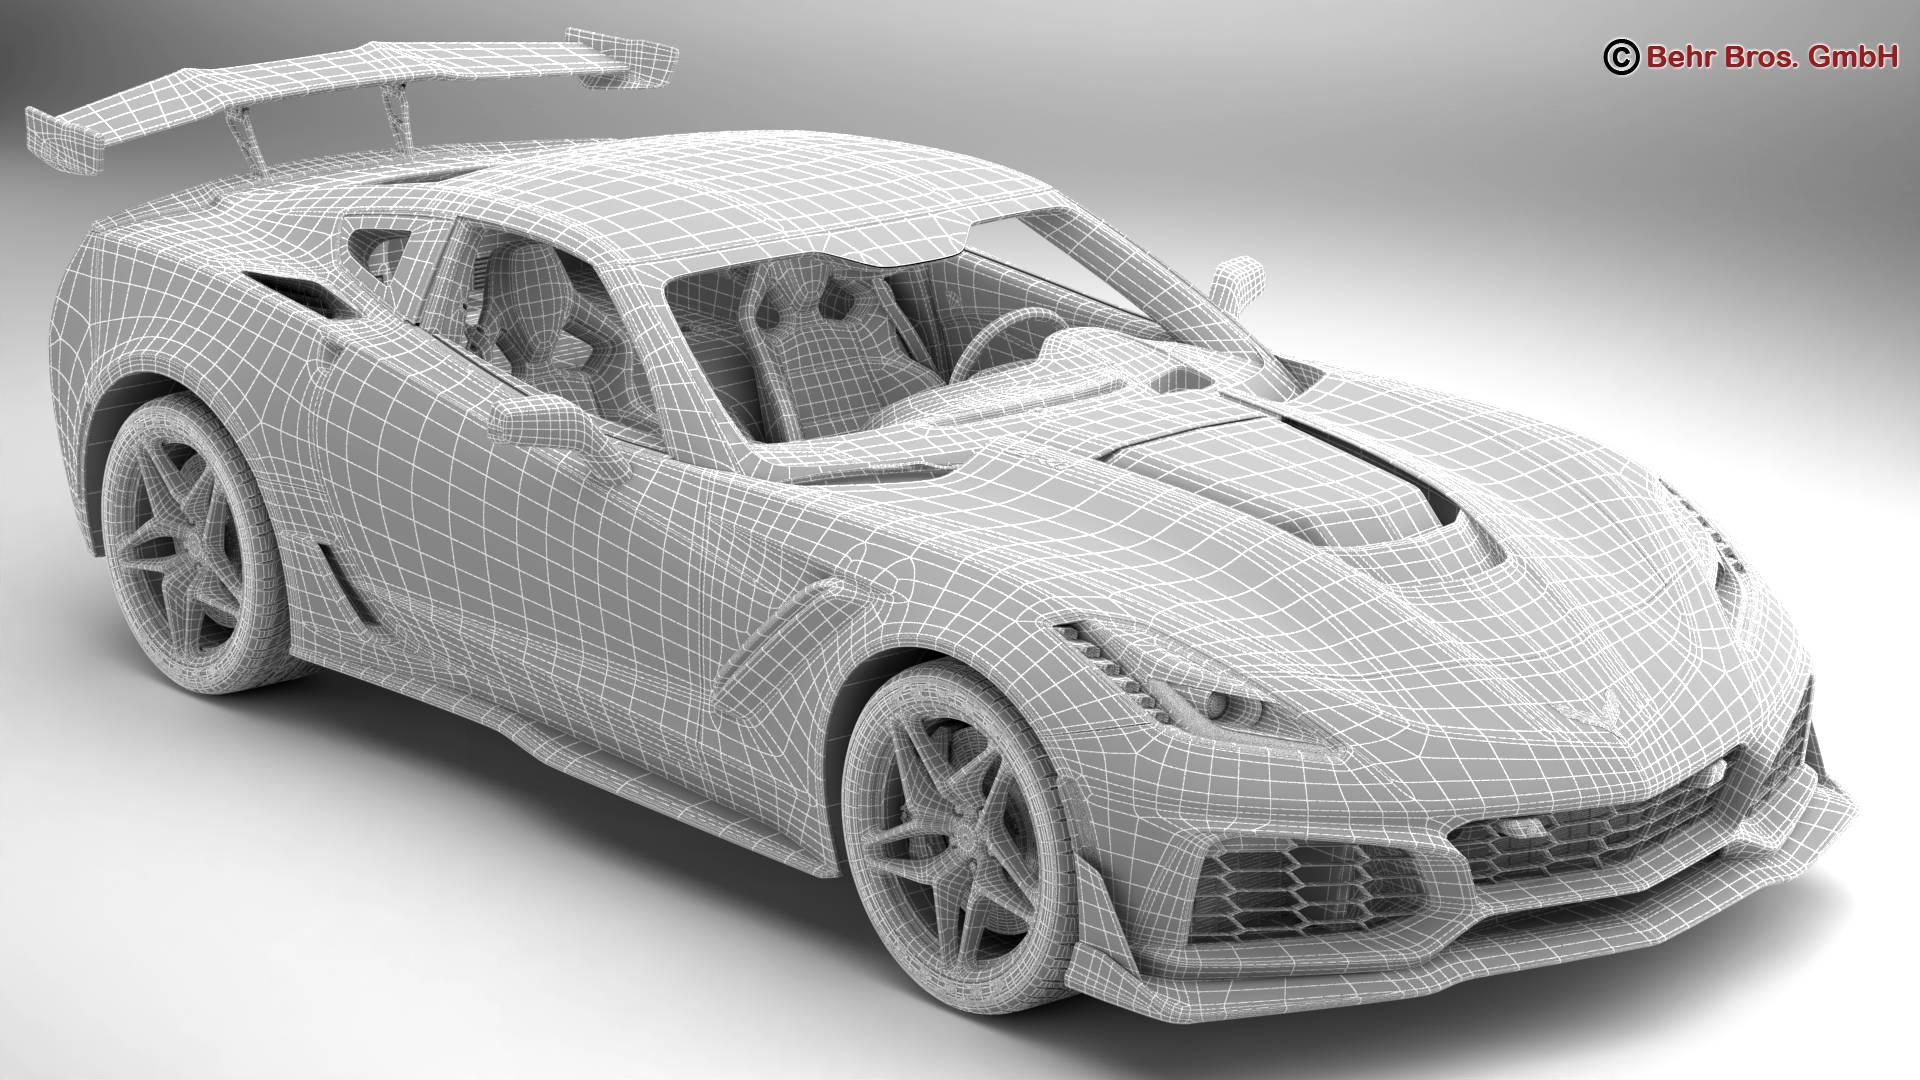 chevrolet corvette zr1 2019 3d model 3ds max fbx c4d lwo ma mb obj 275981